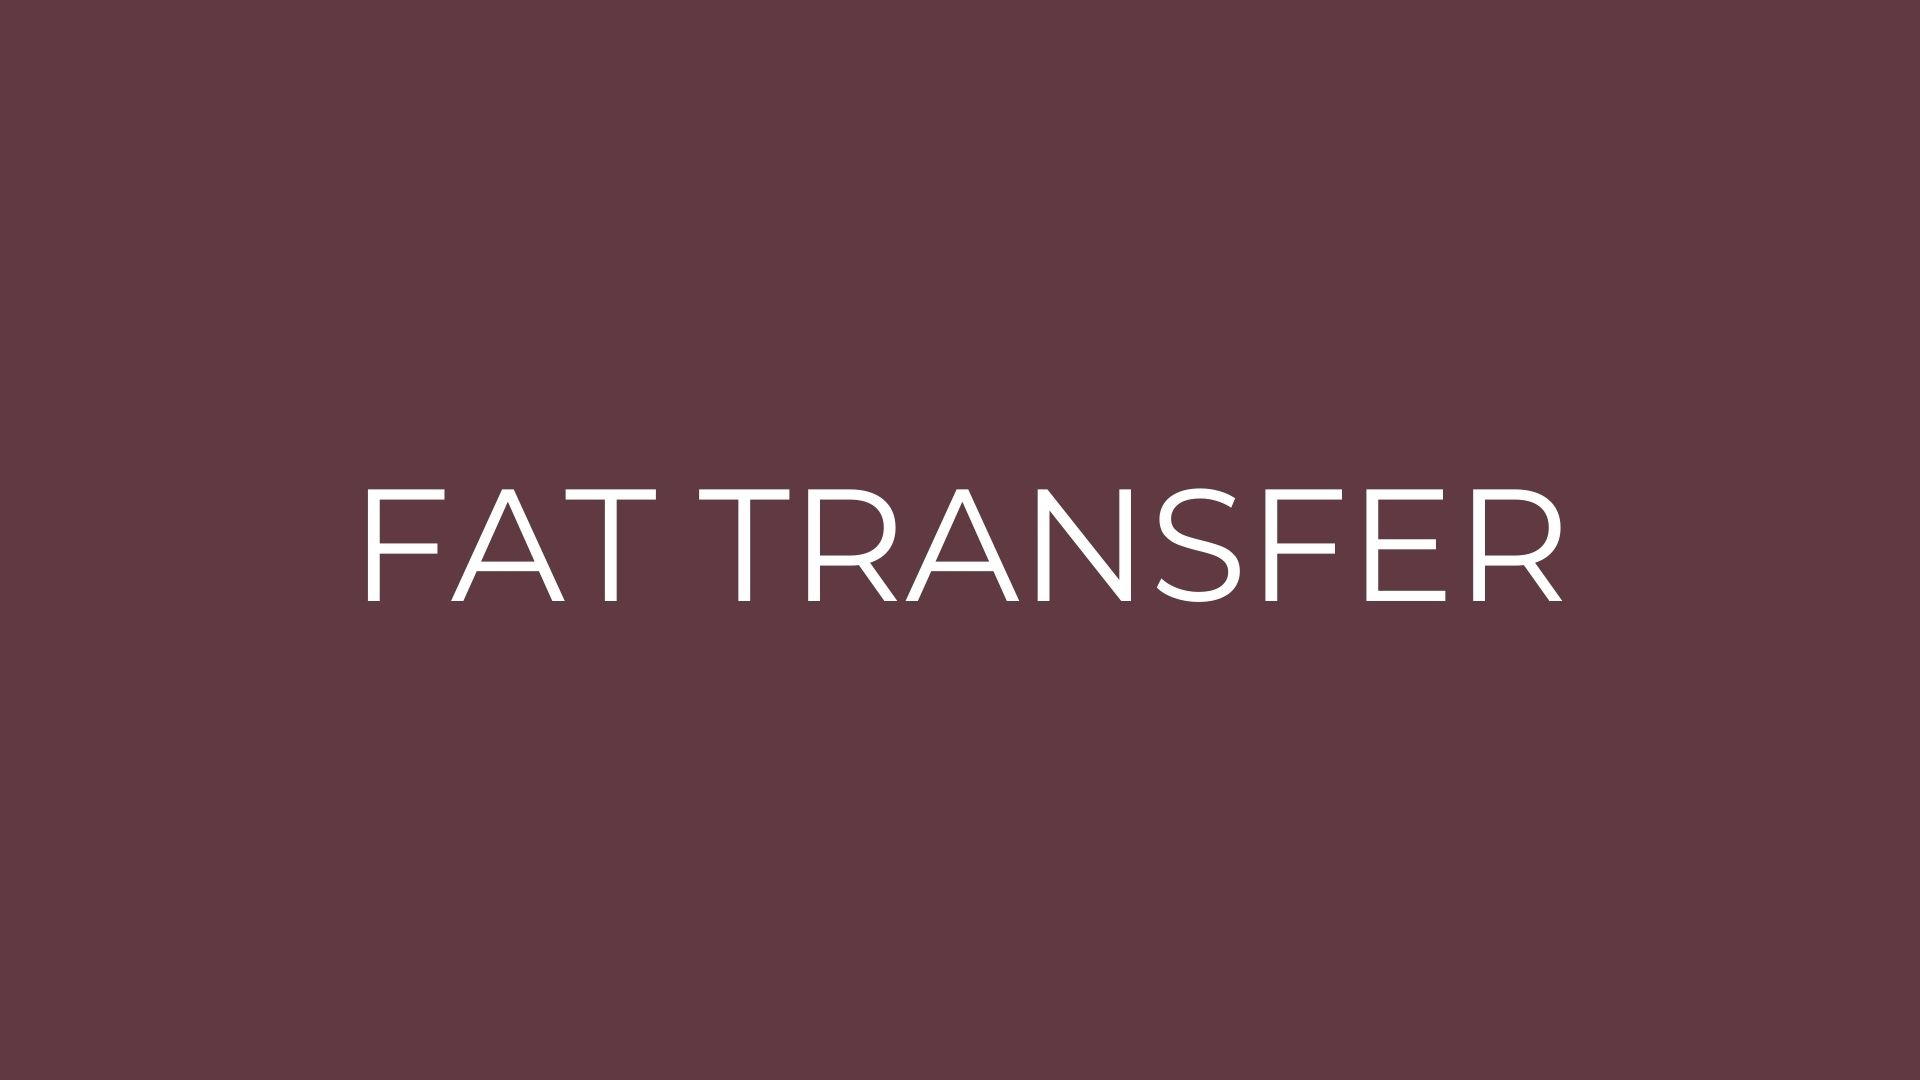 fat transfer procedure